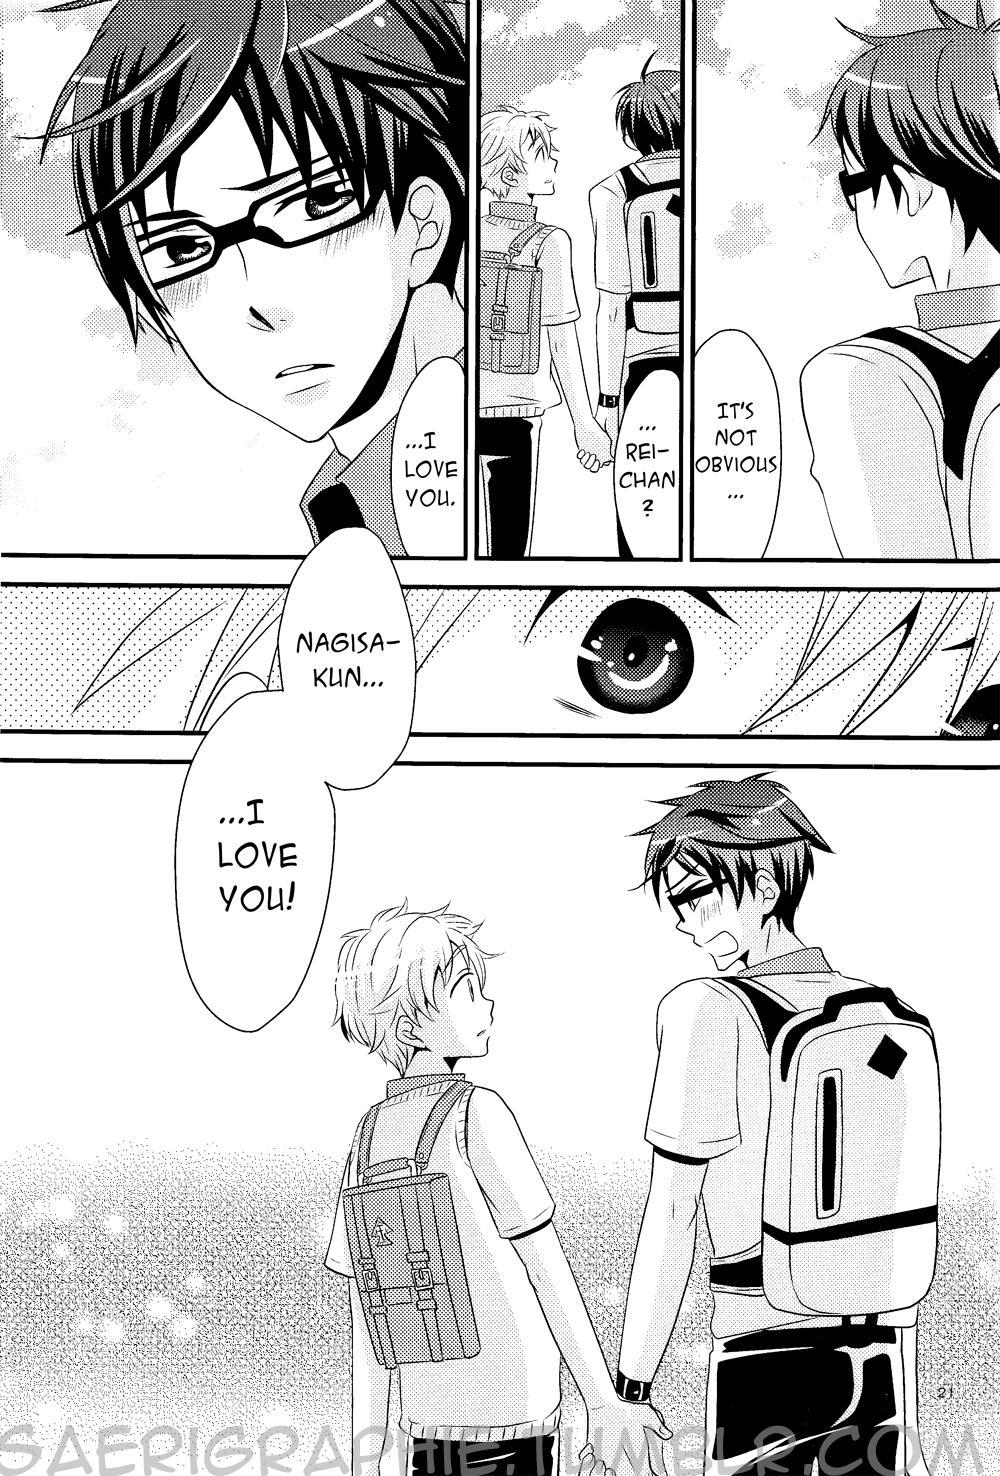 Koibito ga Akogare no Senpai wo Suki Sugite Tsurai | It's Hard When Your Boyfriend Likes an Upperclassman He Admires Too Much 20